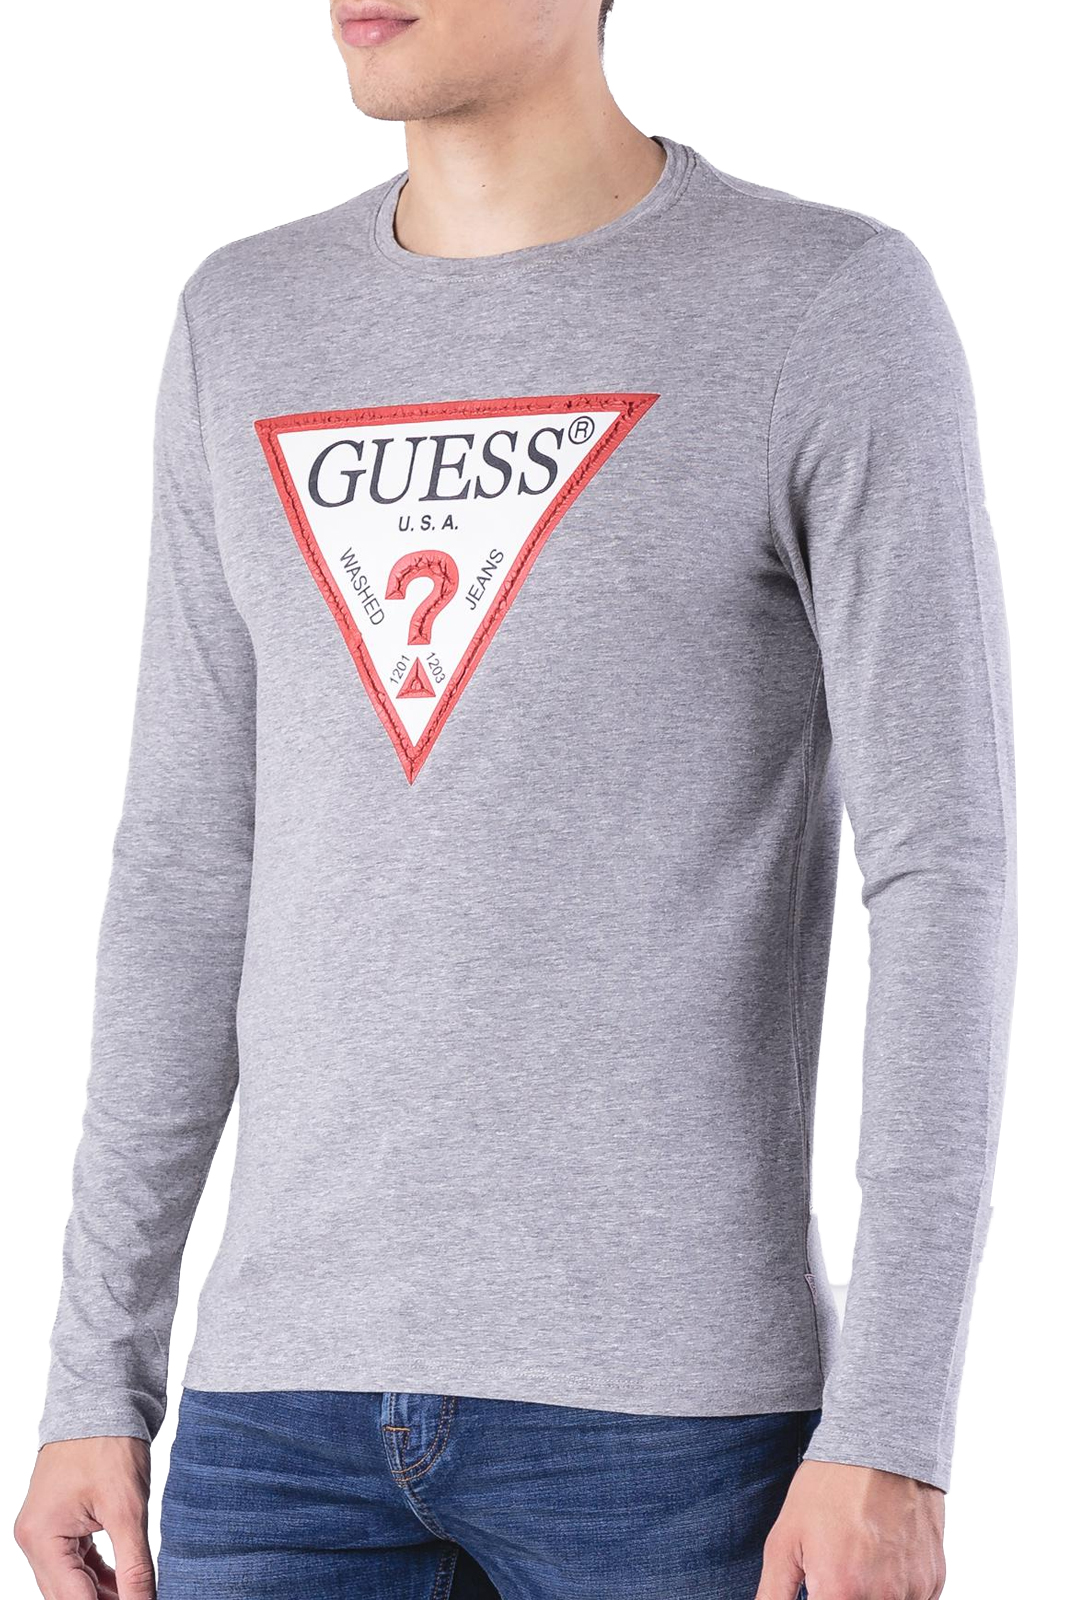 Tee-shirts  Guess jeans M84I17 J1300 STONE HEATHER GREY